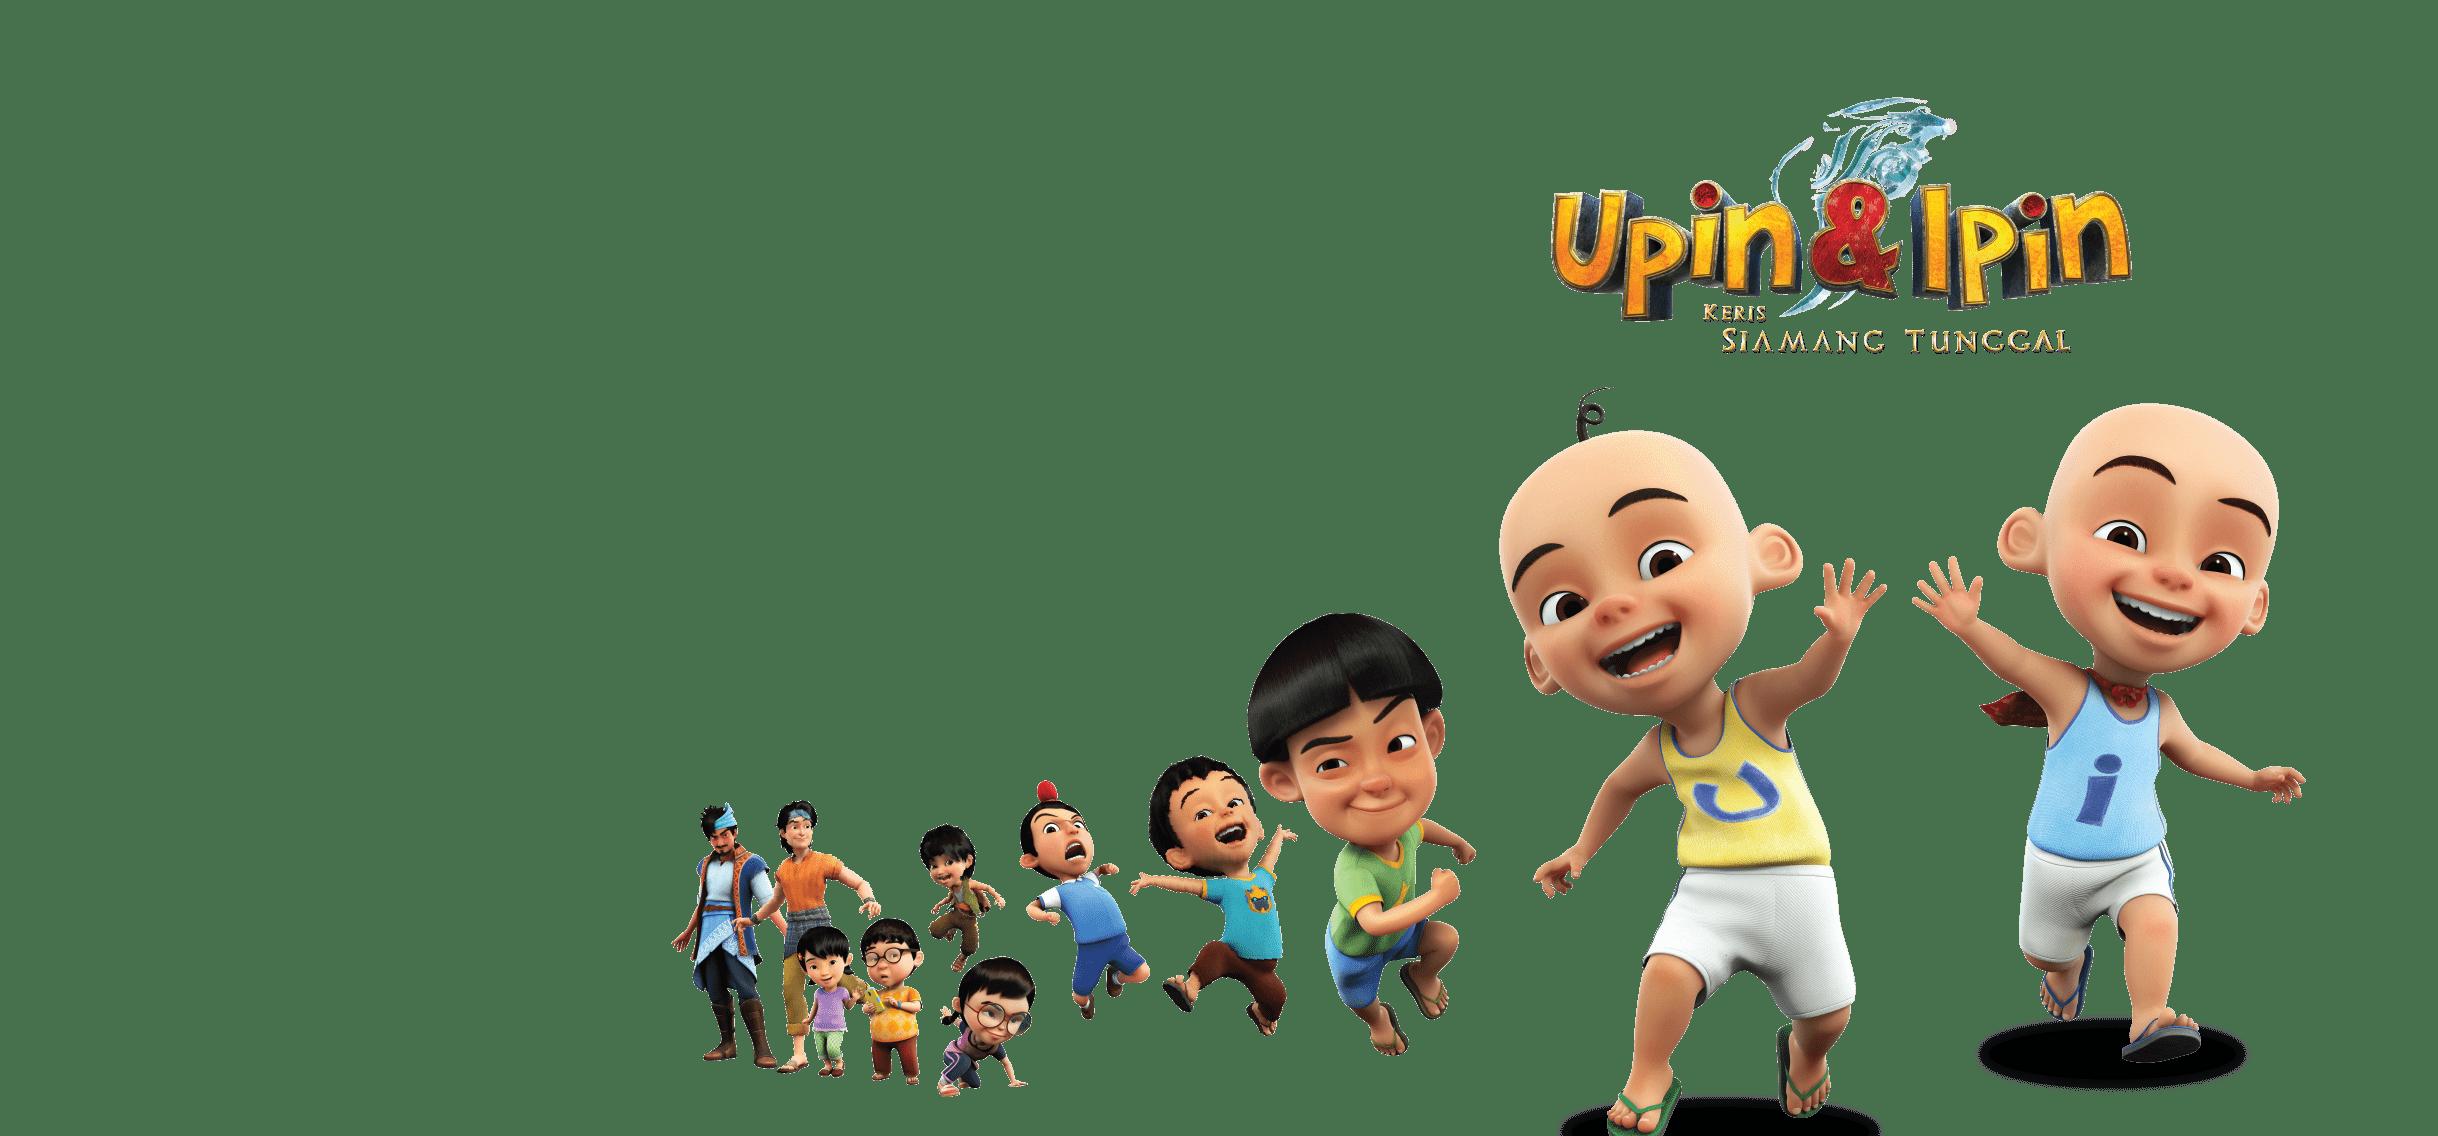 Upin & Ipin Wallpapers Top Free Upin & Ipin Backgrounds